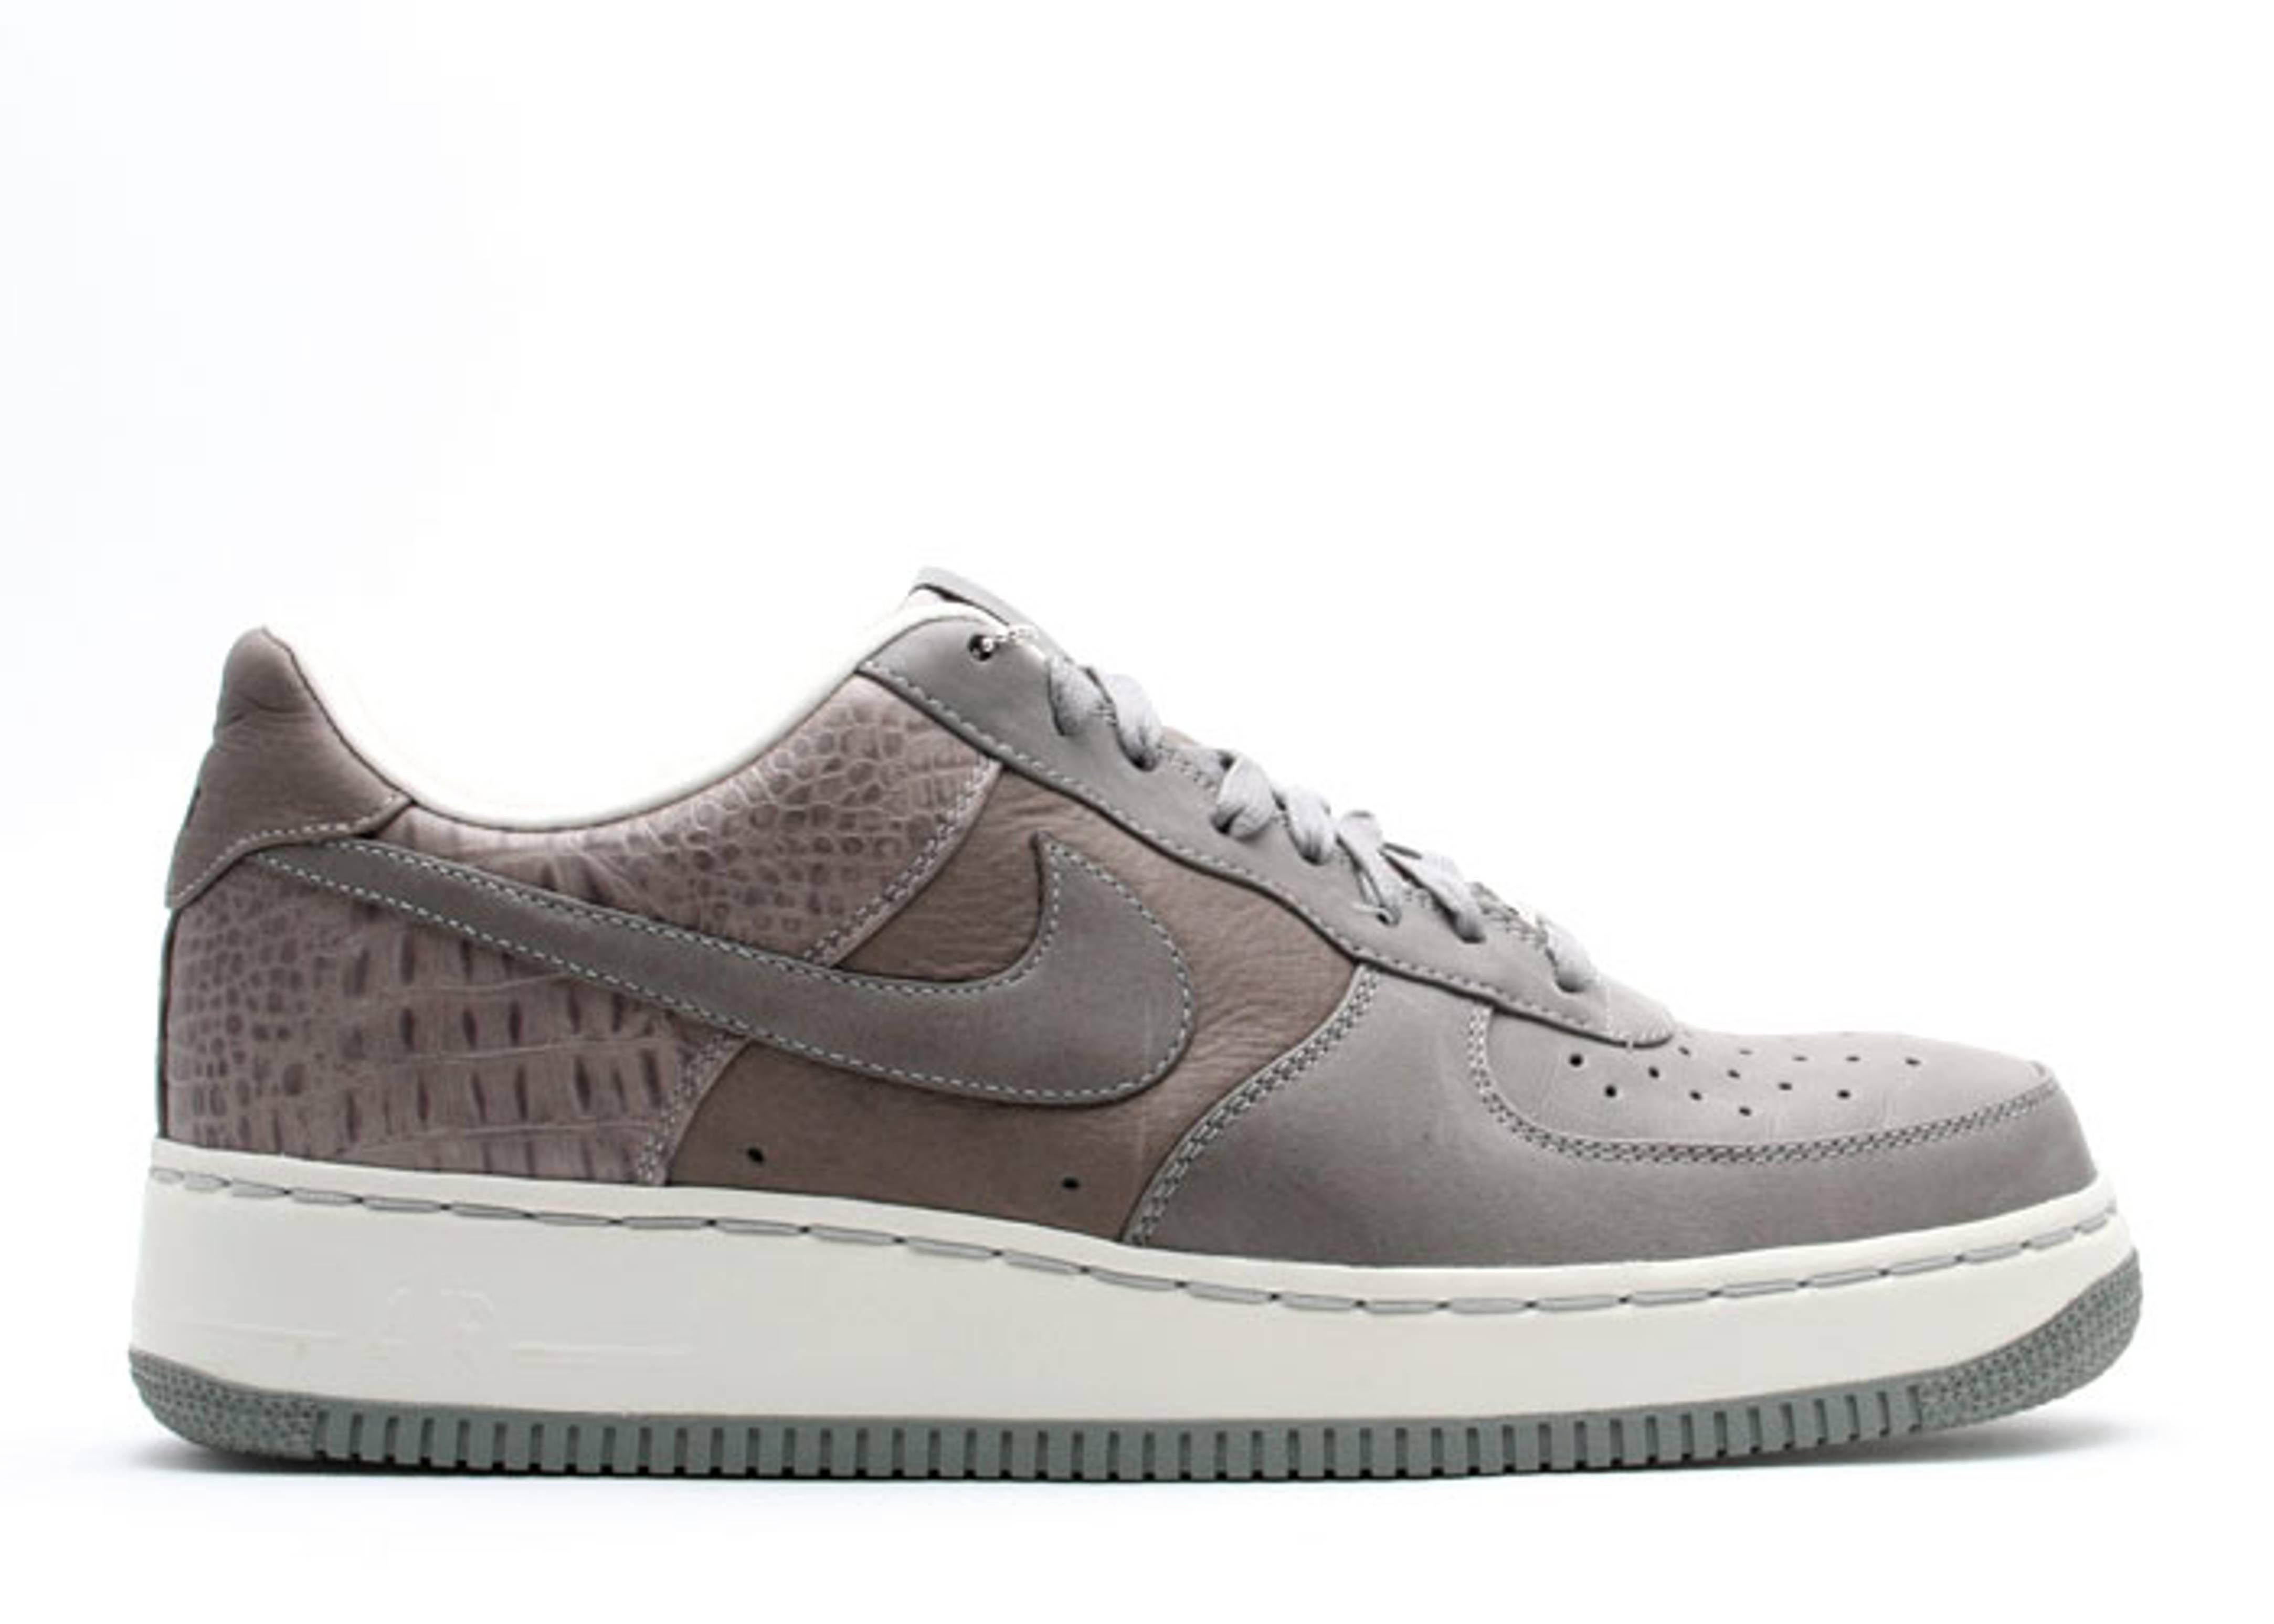 Air Force 1 Supreme 07 Qk Nike 316133 002 medium grey